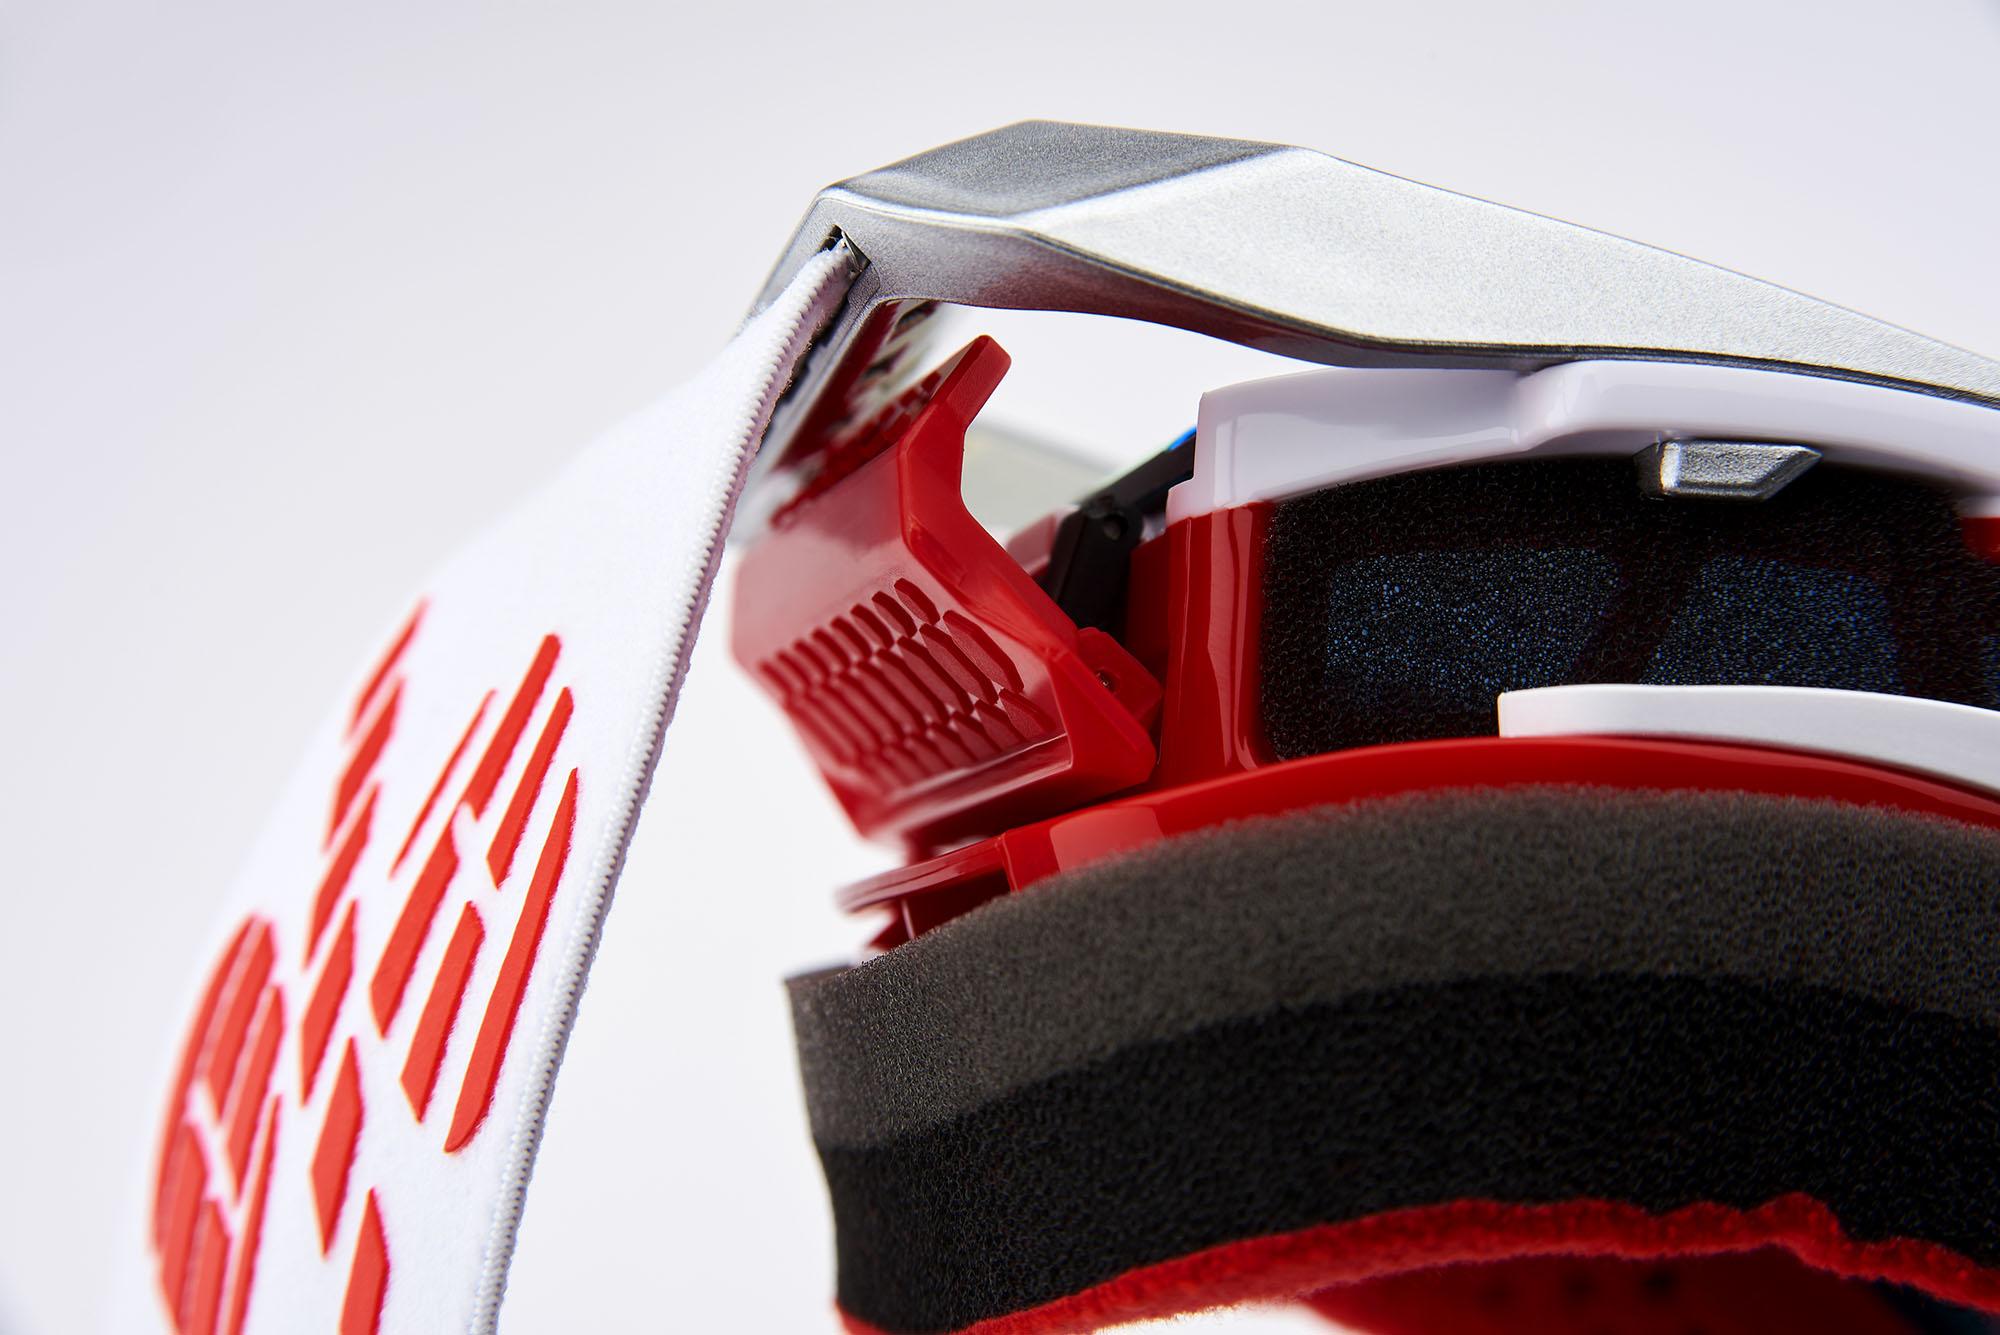 50710-355-02-Detail-107.jpg